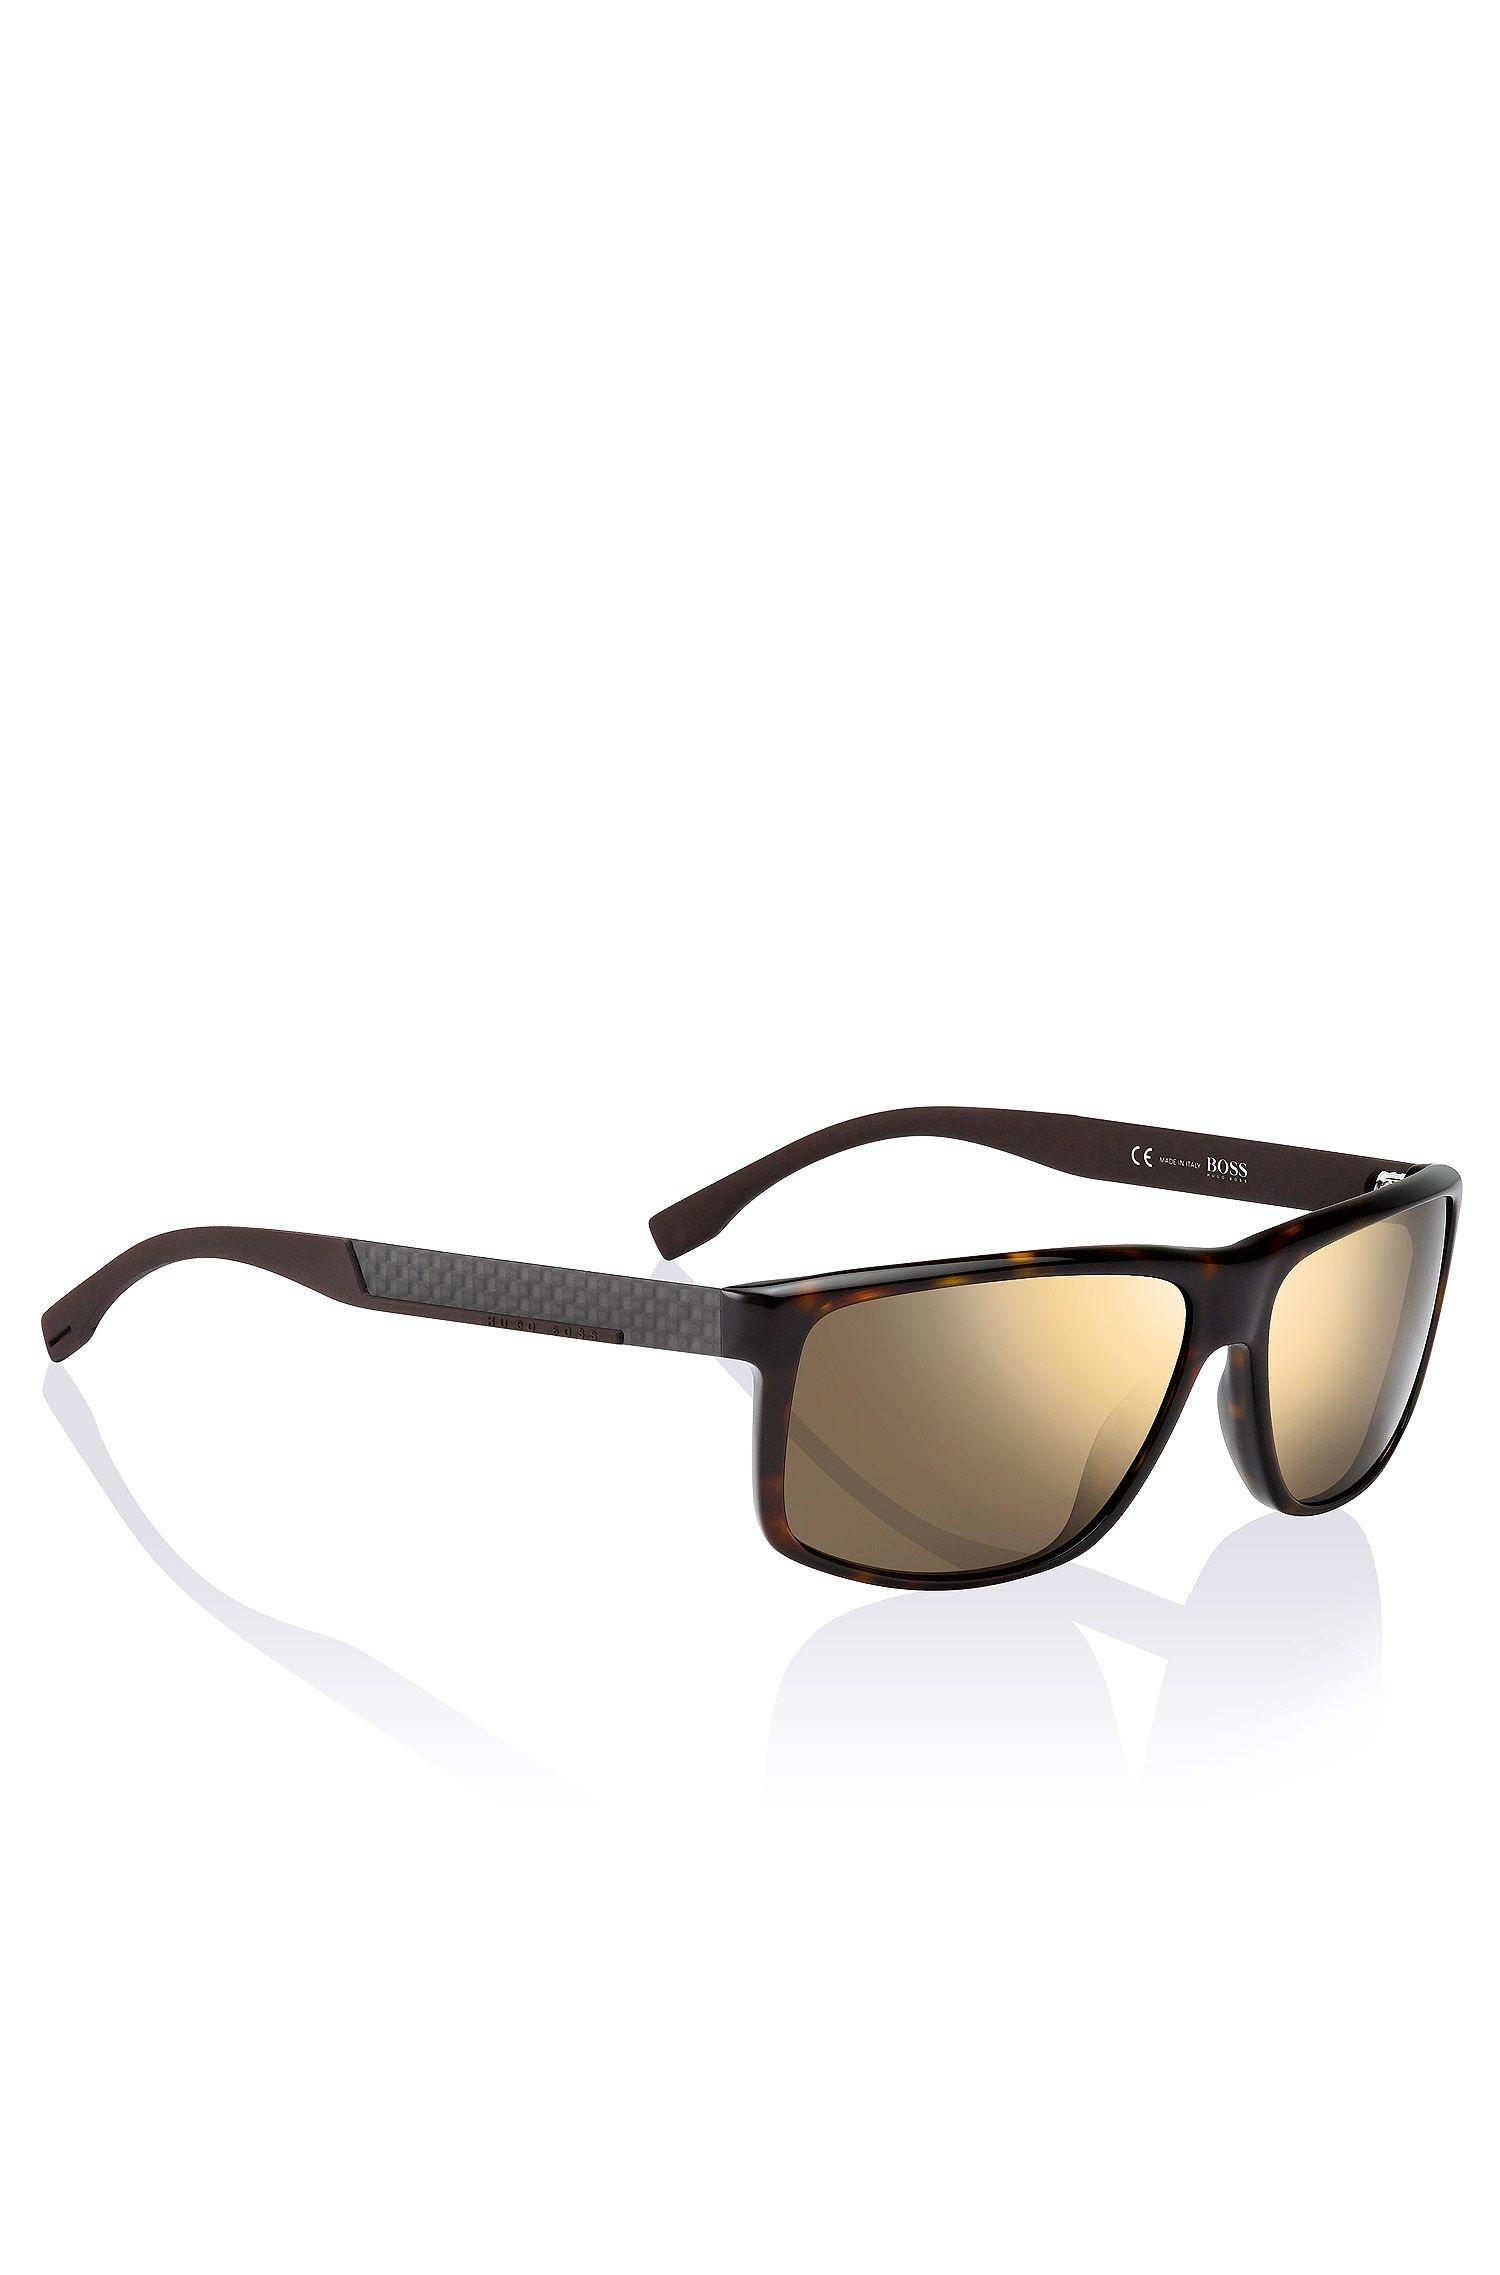 Gafas de sol 'BOSS 0637/S'